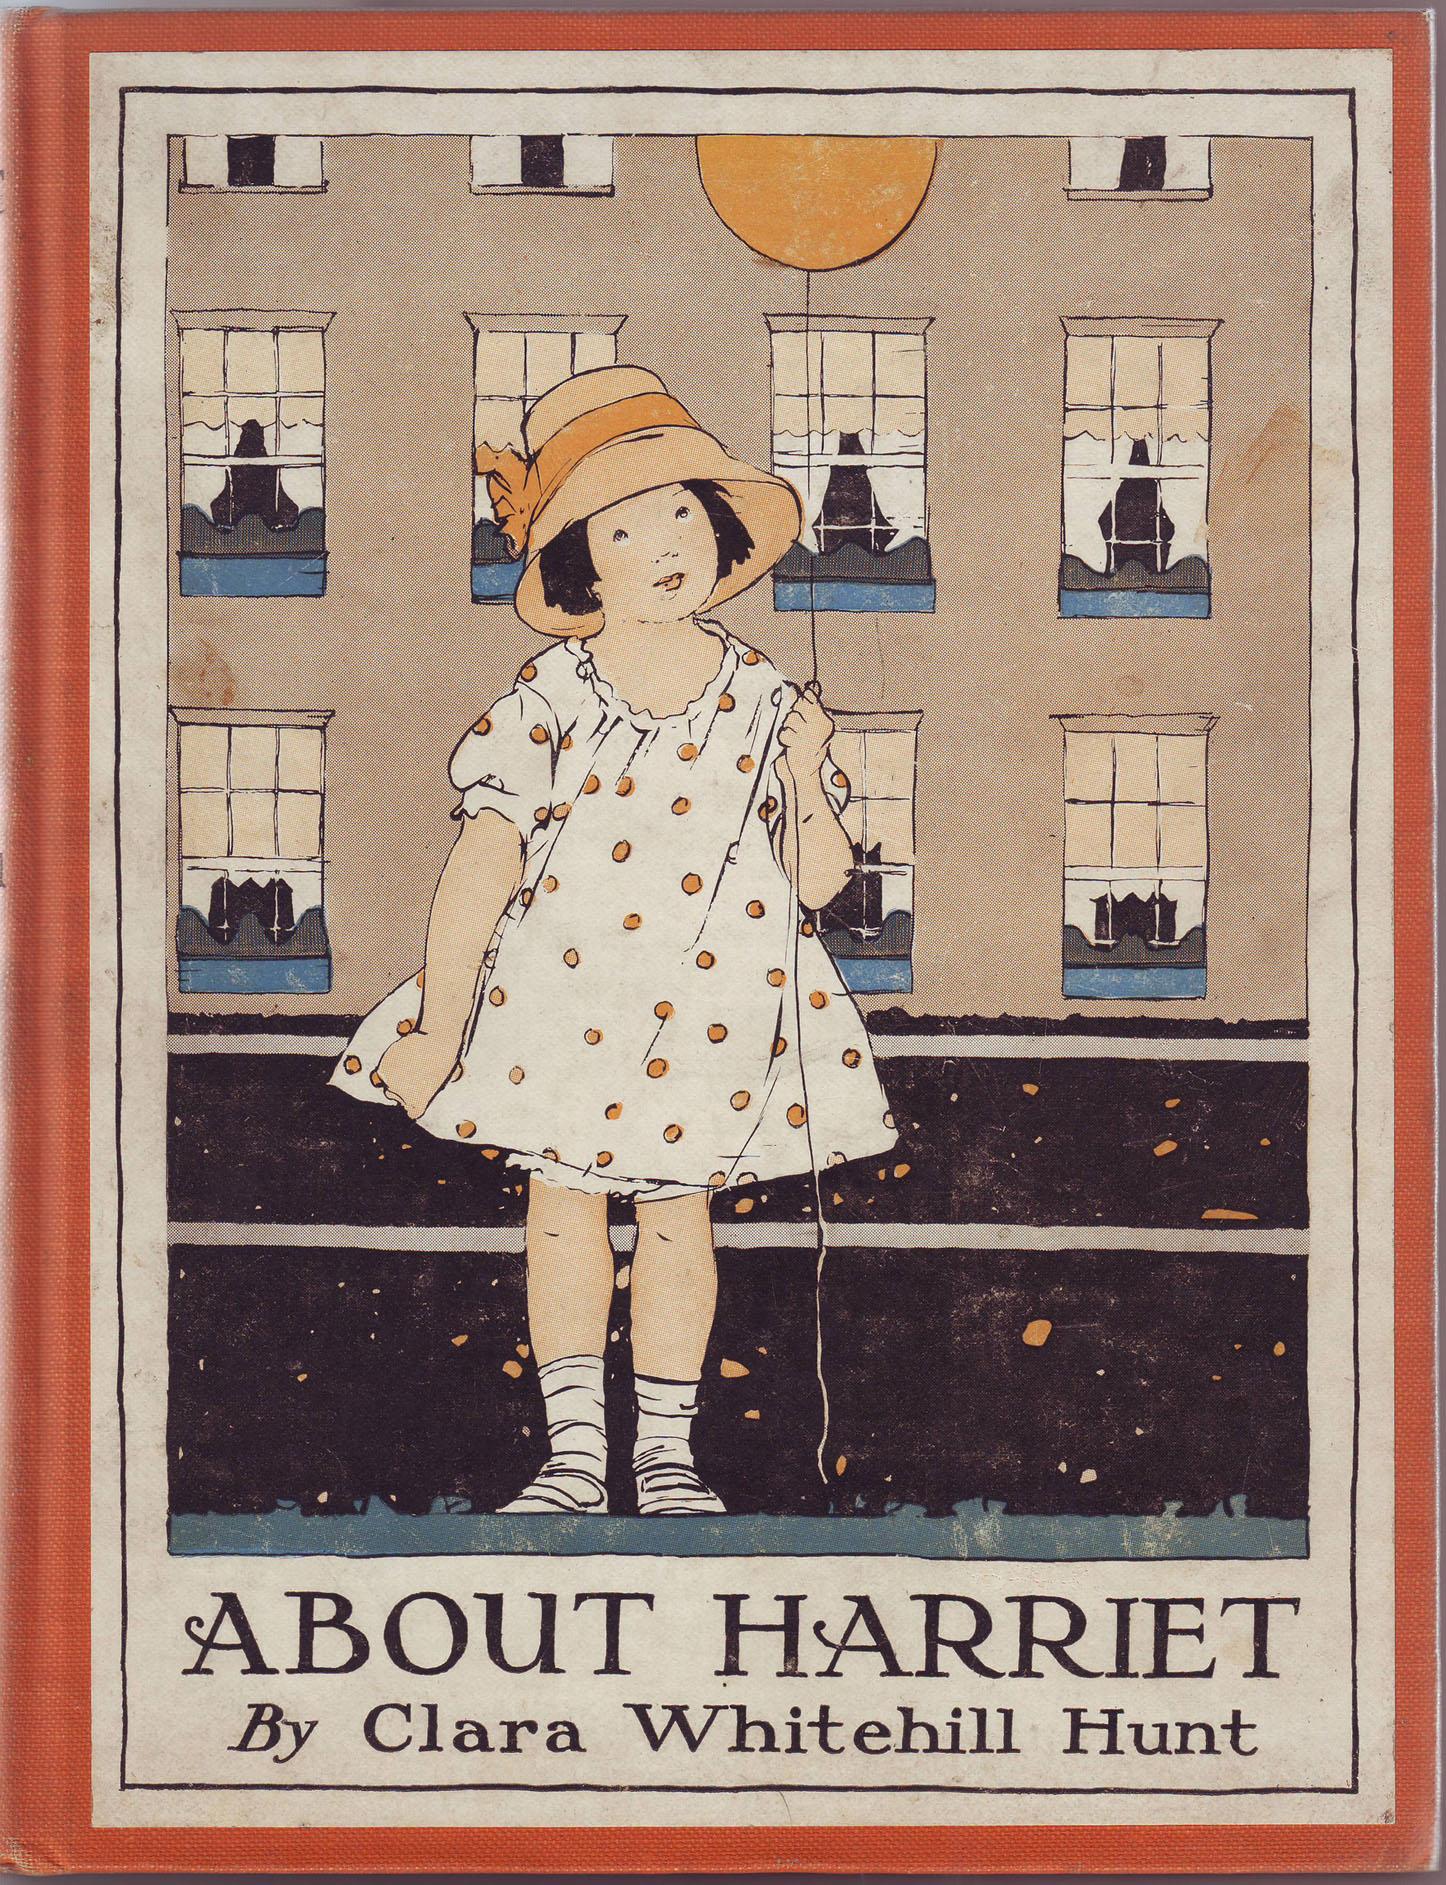 'About Harriet'